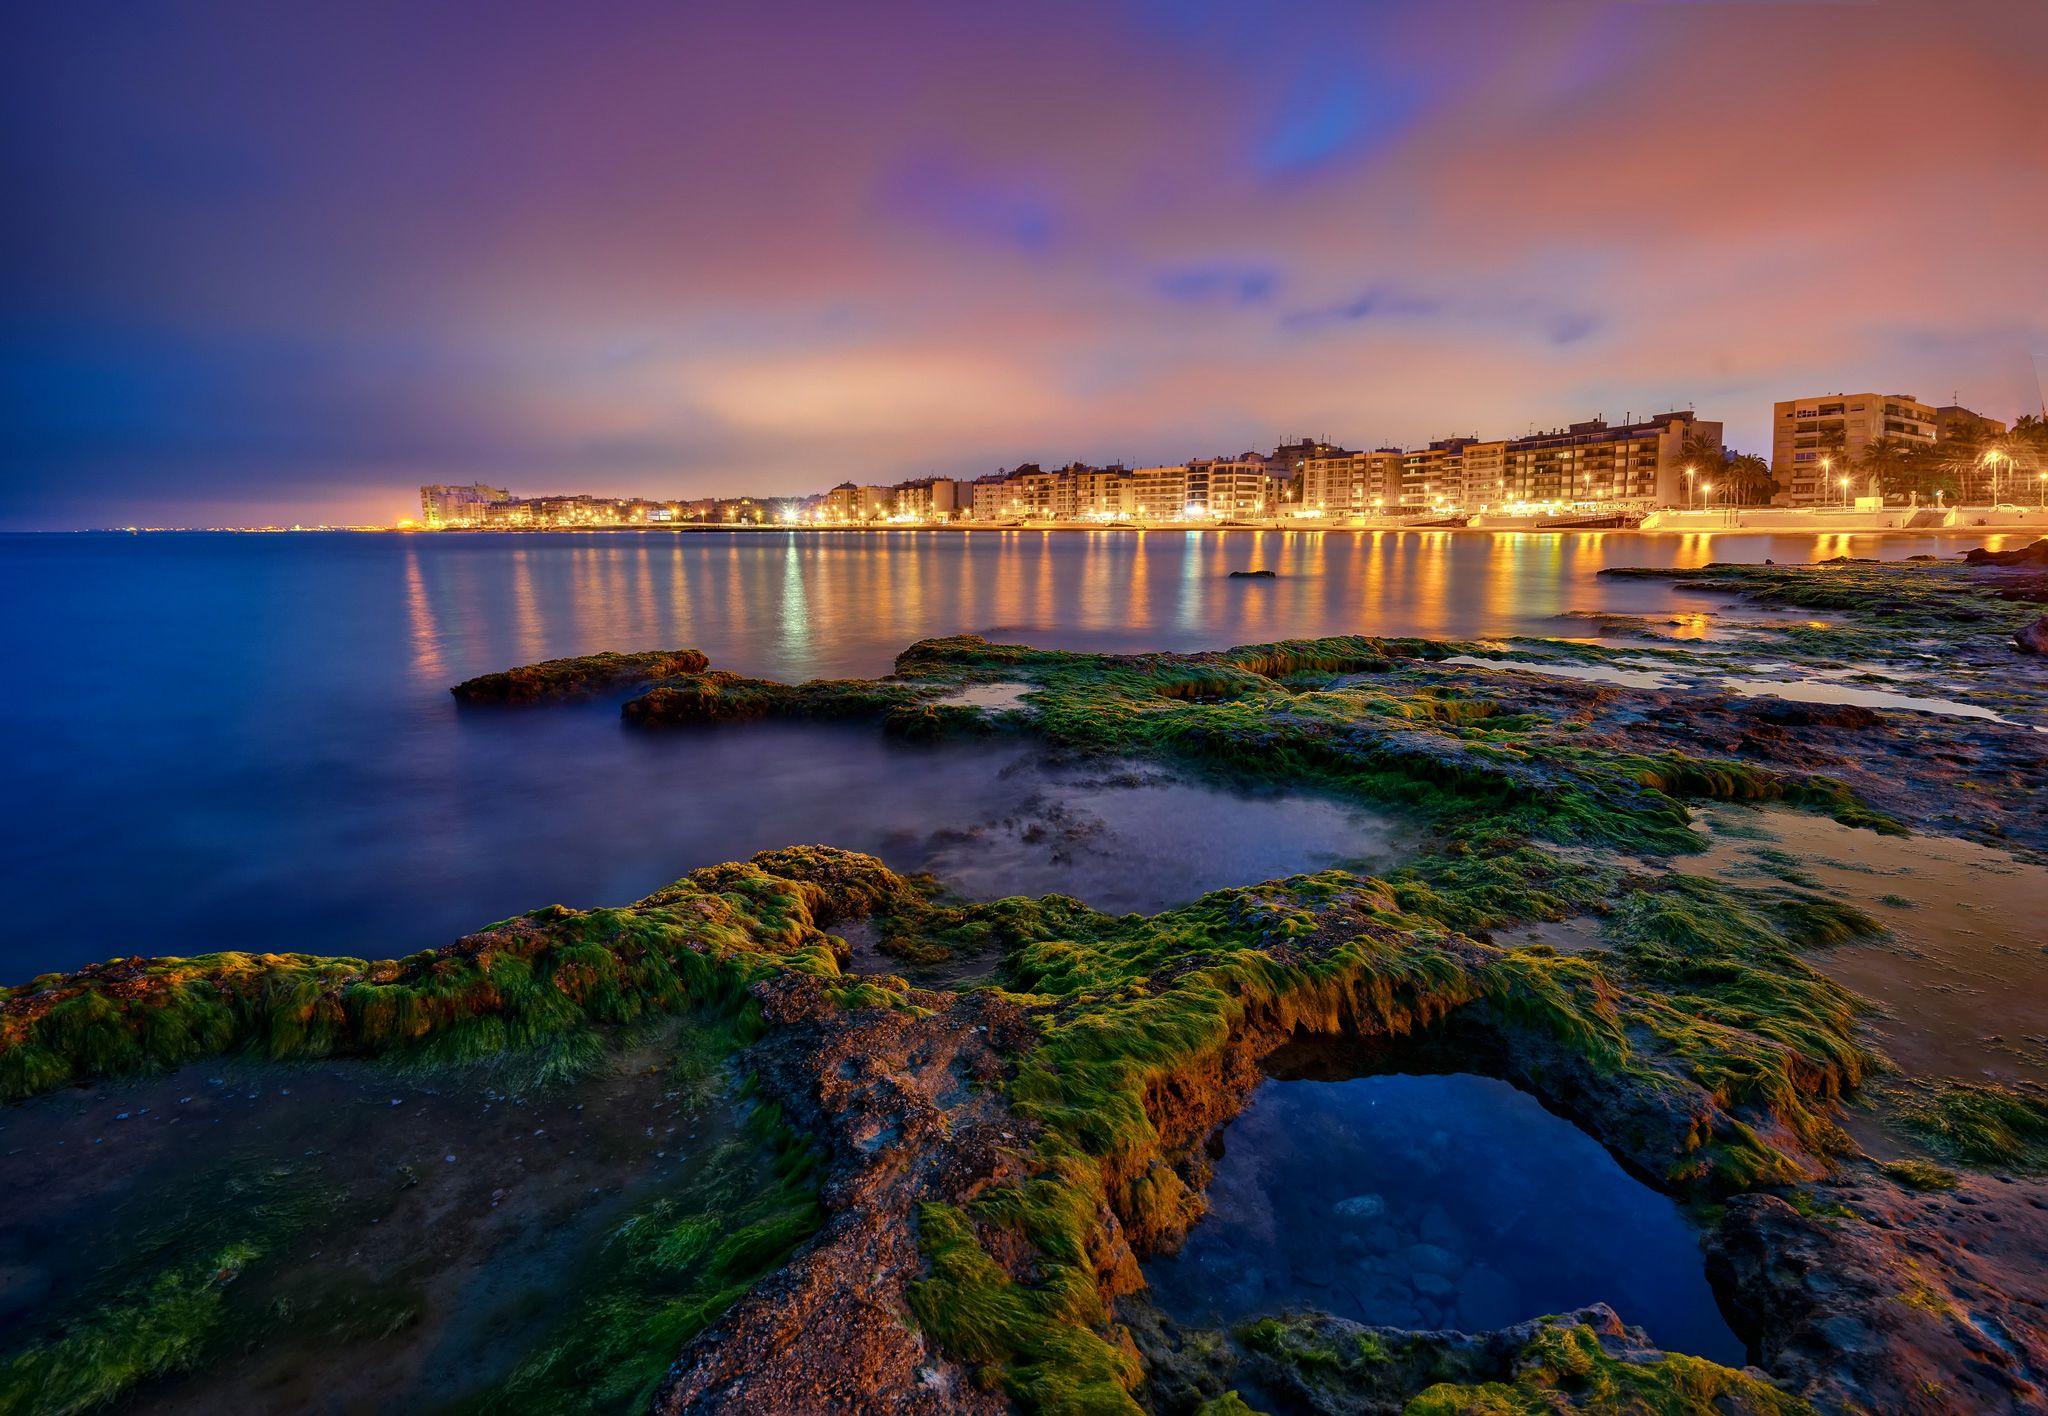 Espagne C Te Paysage Dans L Art Torrevieja Nuit Bryophyta Nature  # Muebles Torrevieja Spain